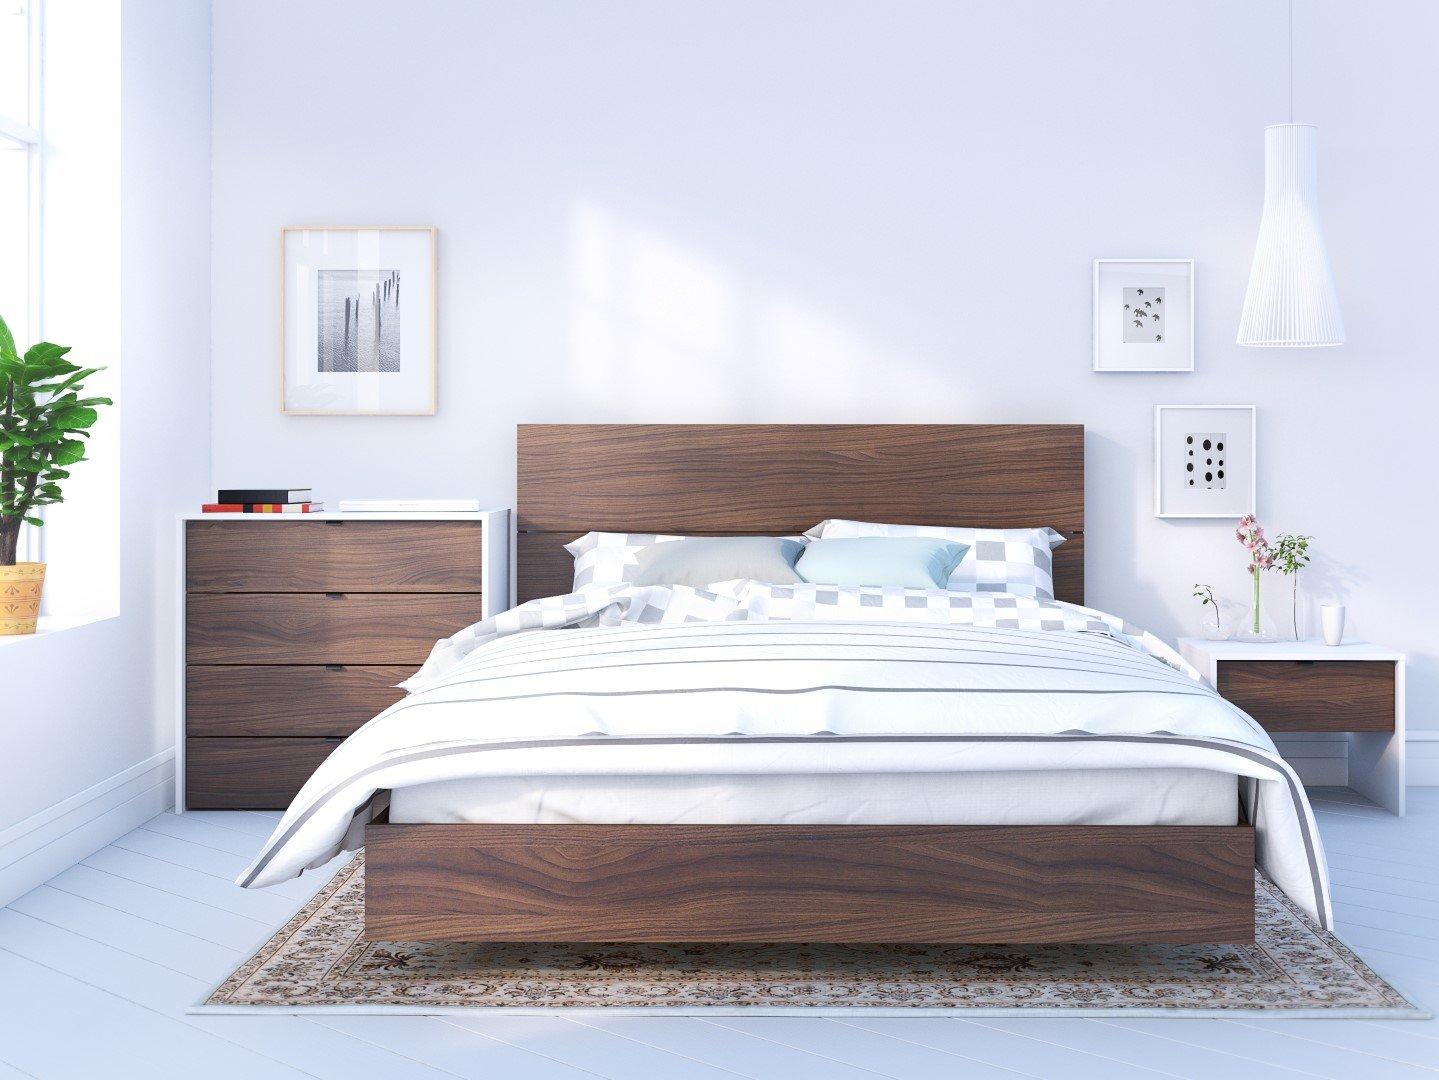 Amazon.com: Nexera Identi-T Queen Size Bedroom Set #400890 from ...